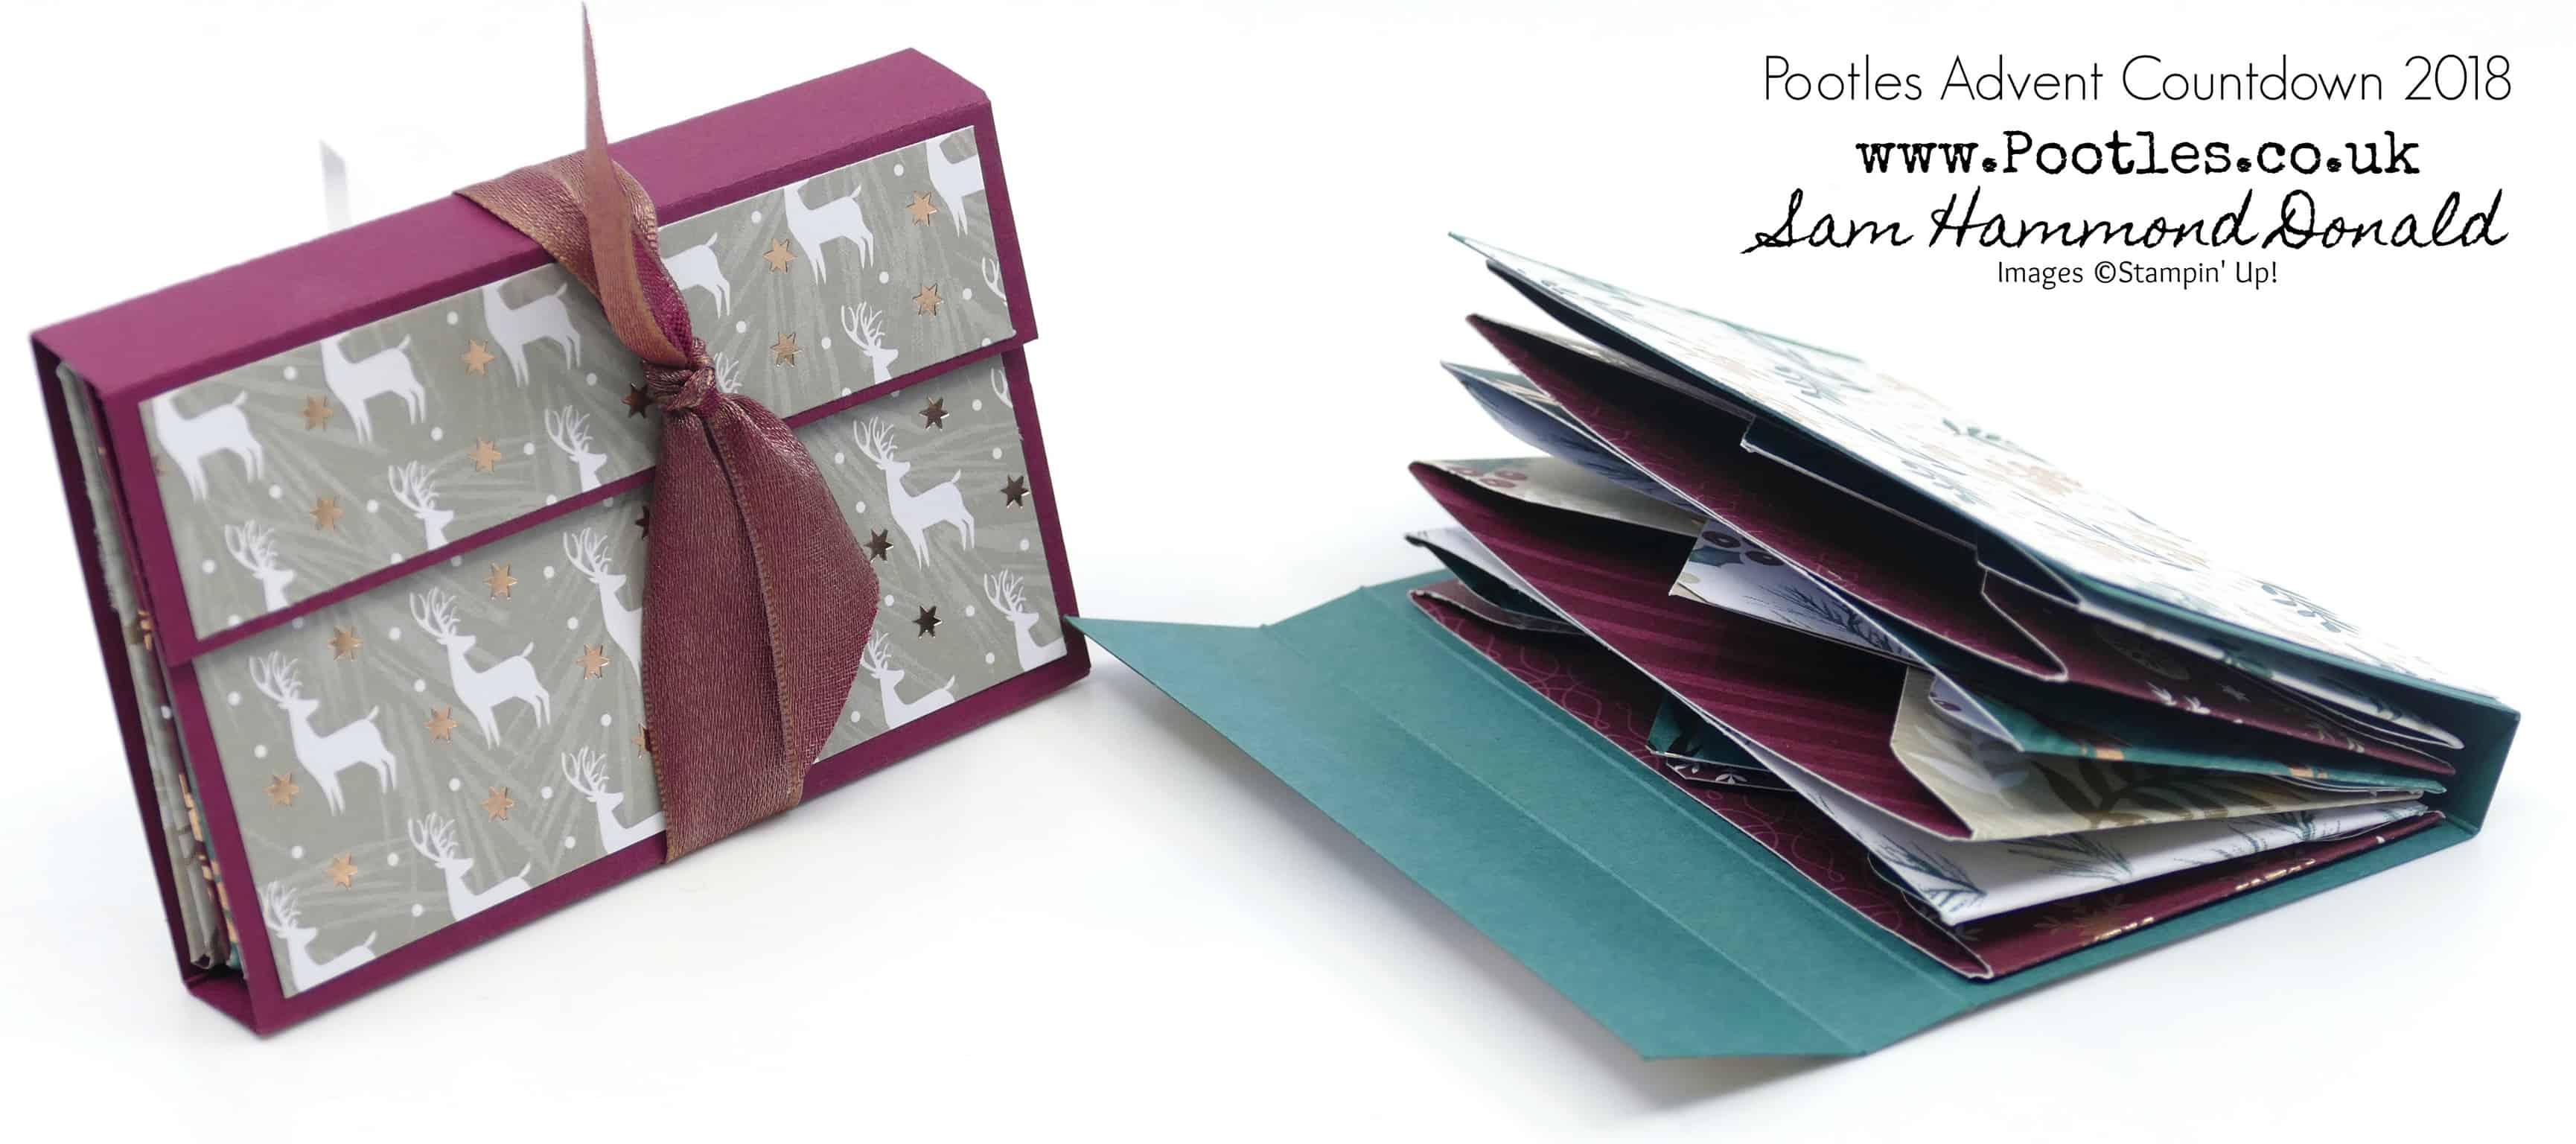 Mini Wallet | Jouets anciens, Tuto, Couture | 1805x4066